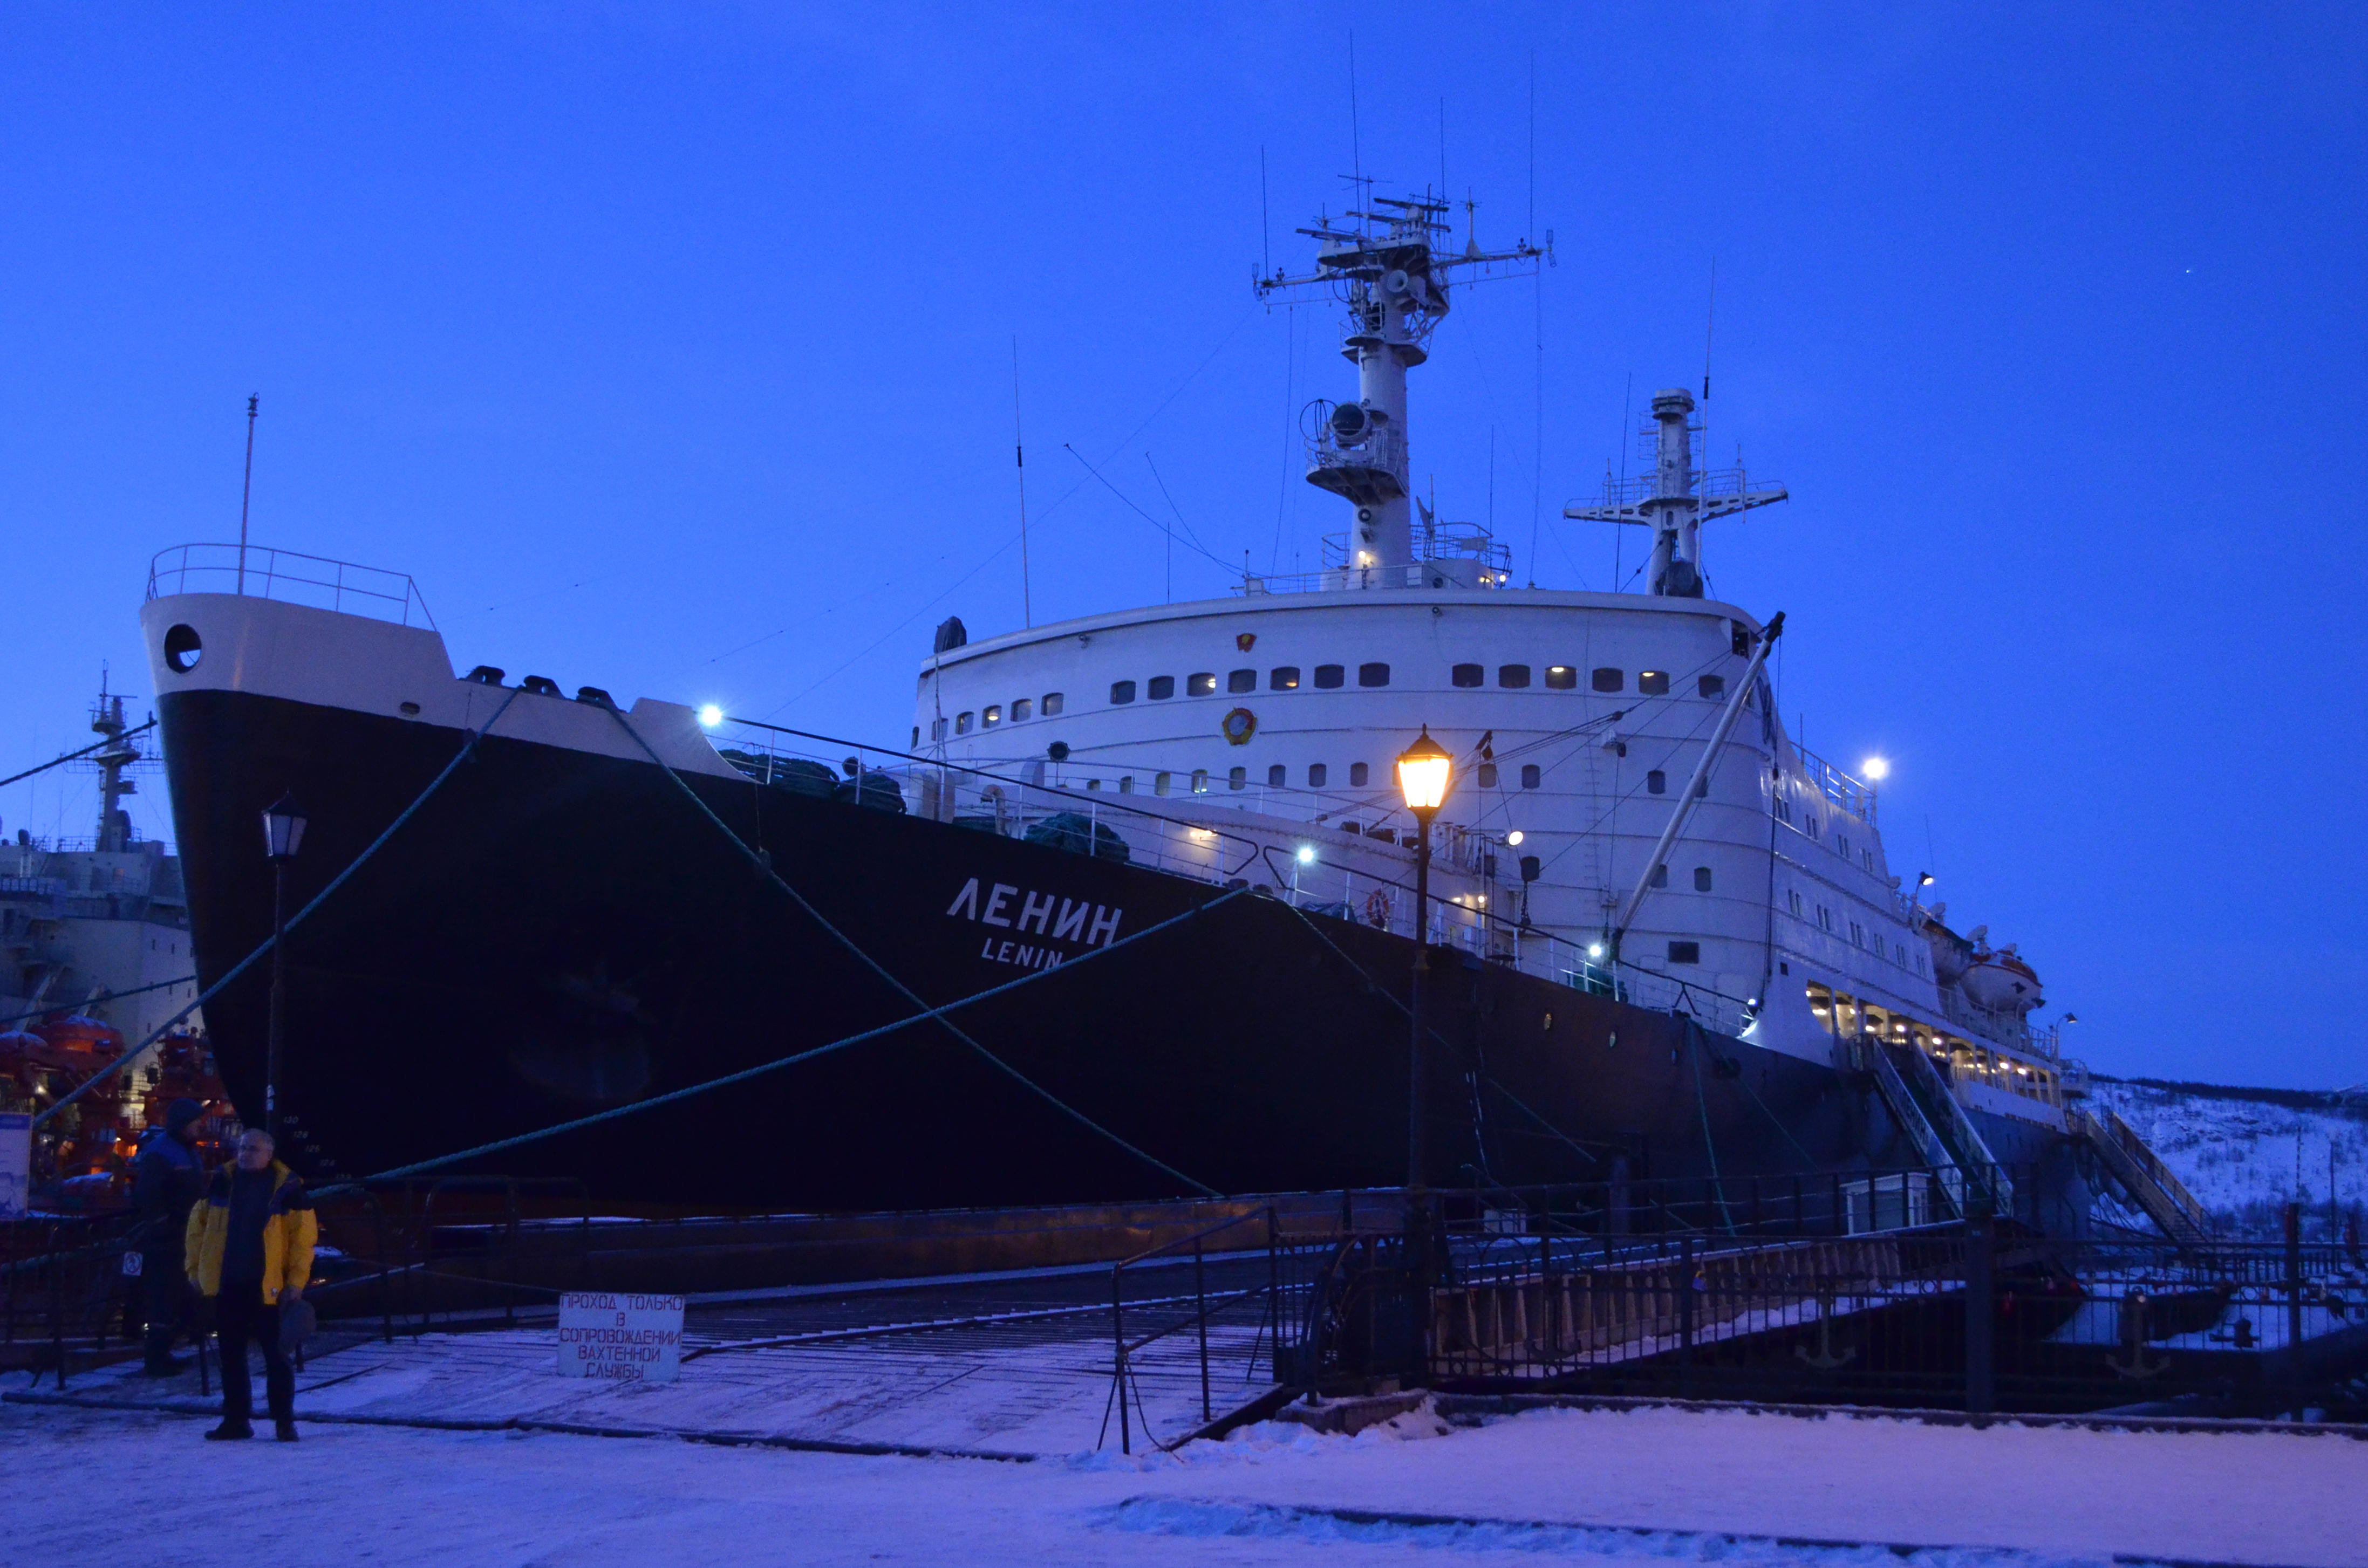 Rusko oslavuje 55. výročí flotily jaderných ledoborců